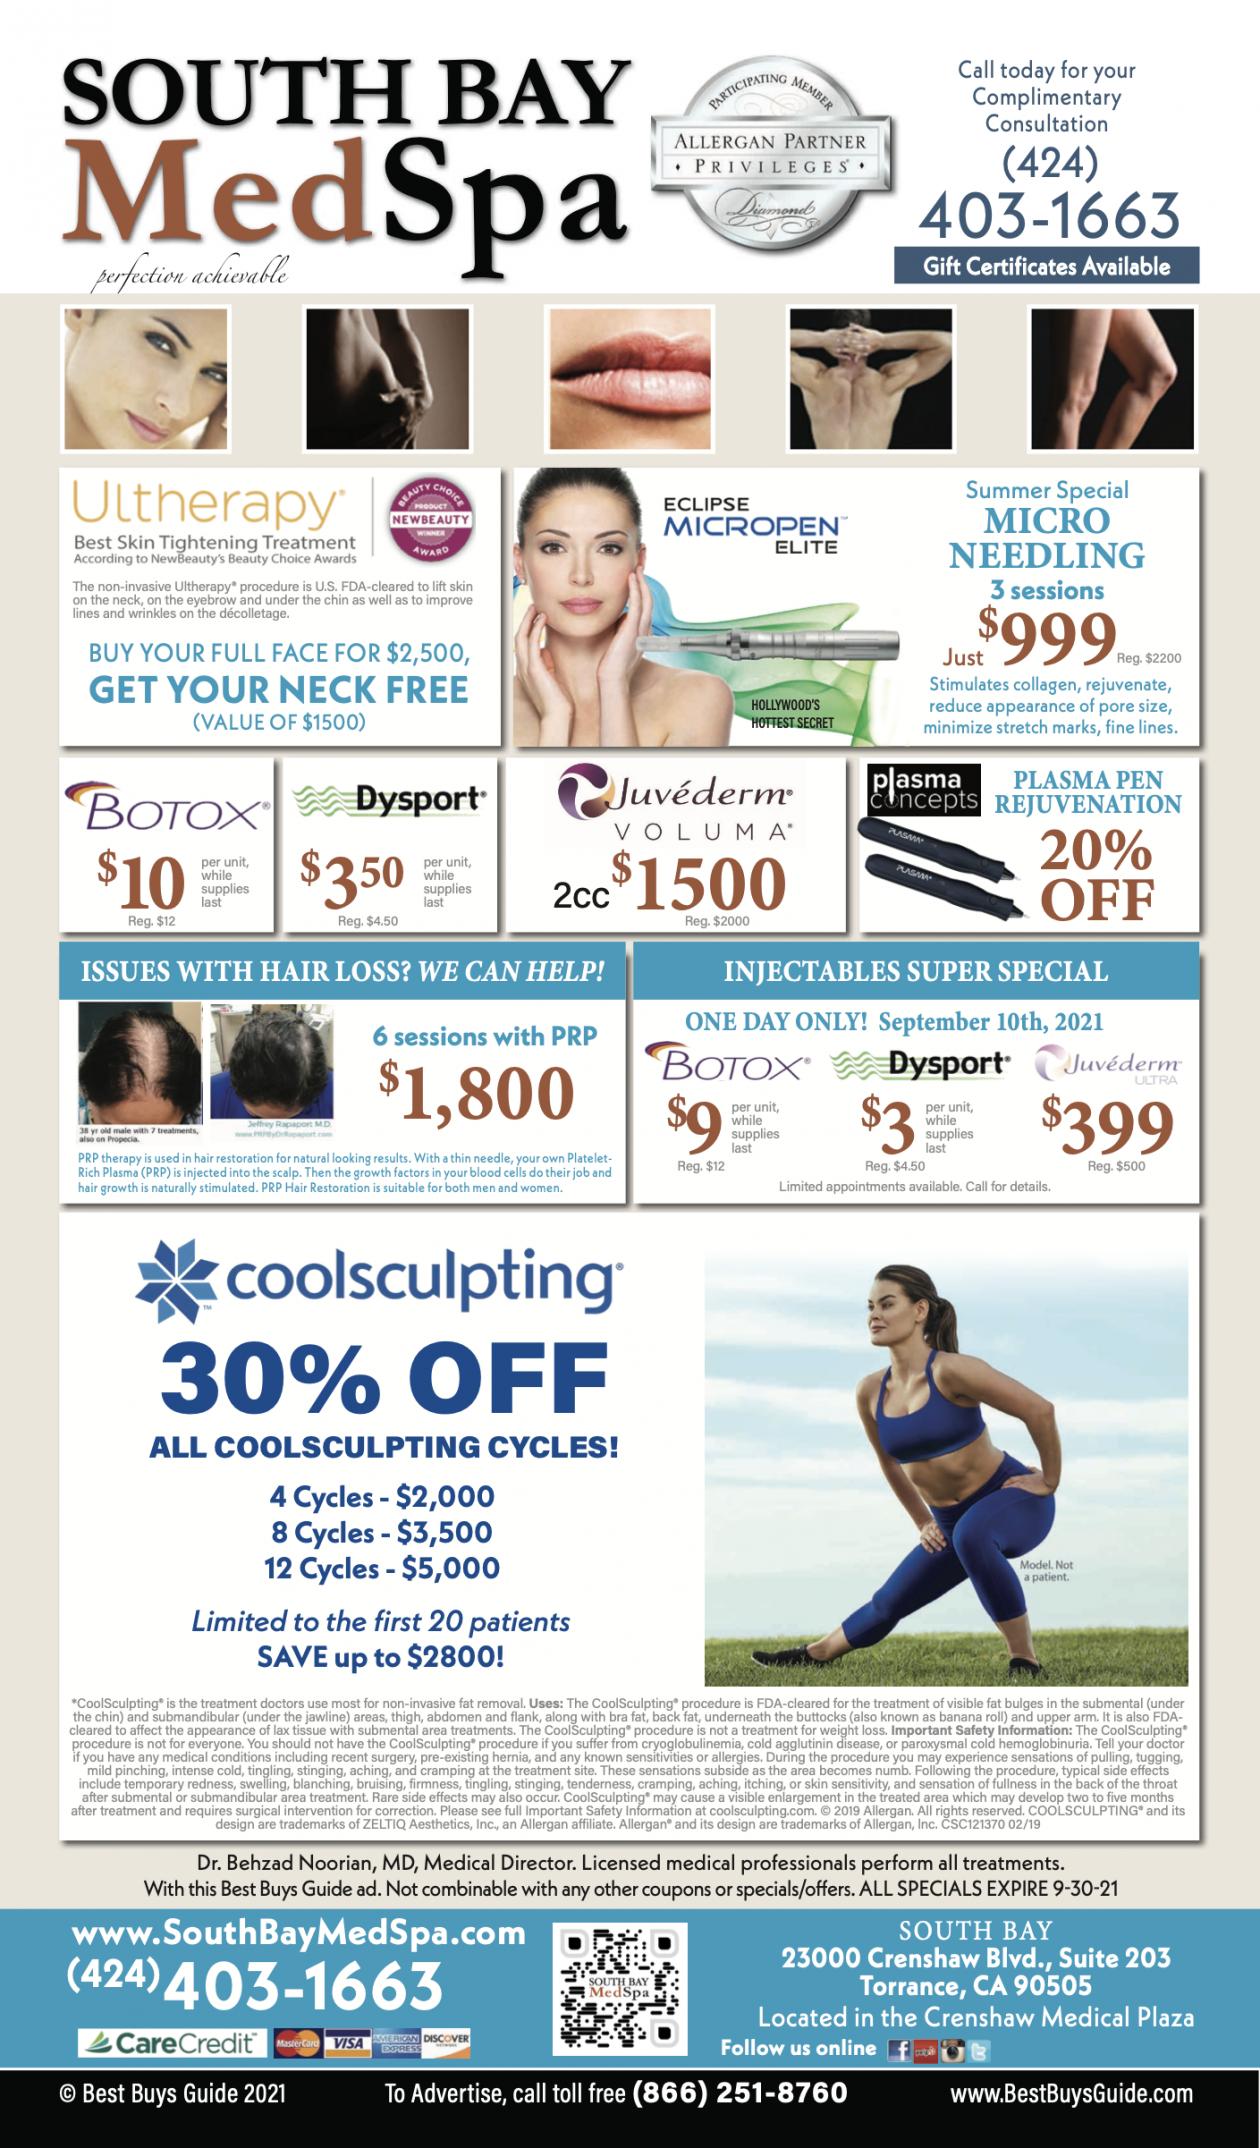 torrance-med-spa-botox-dermal-laser-hair-coolsculpting-promos-deals-offers